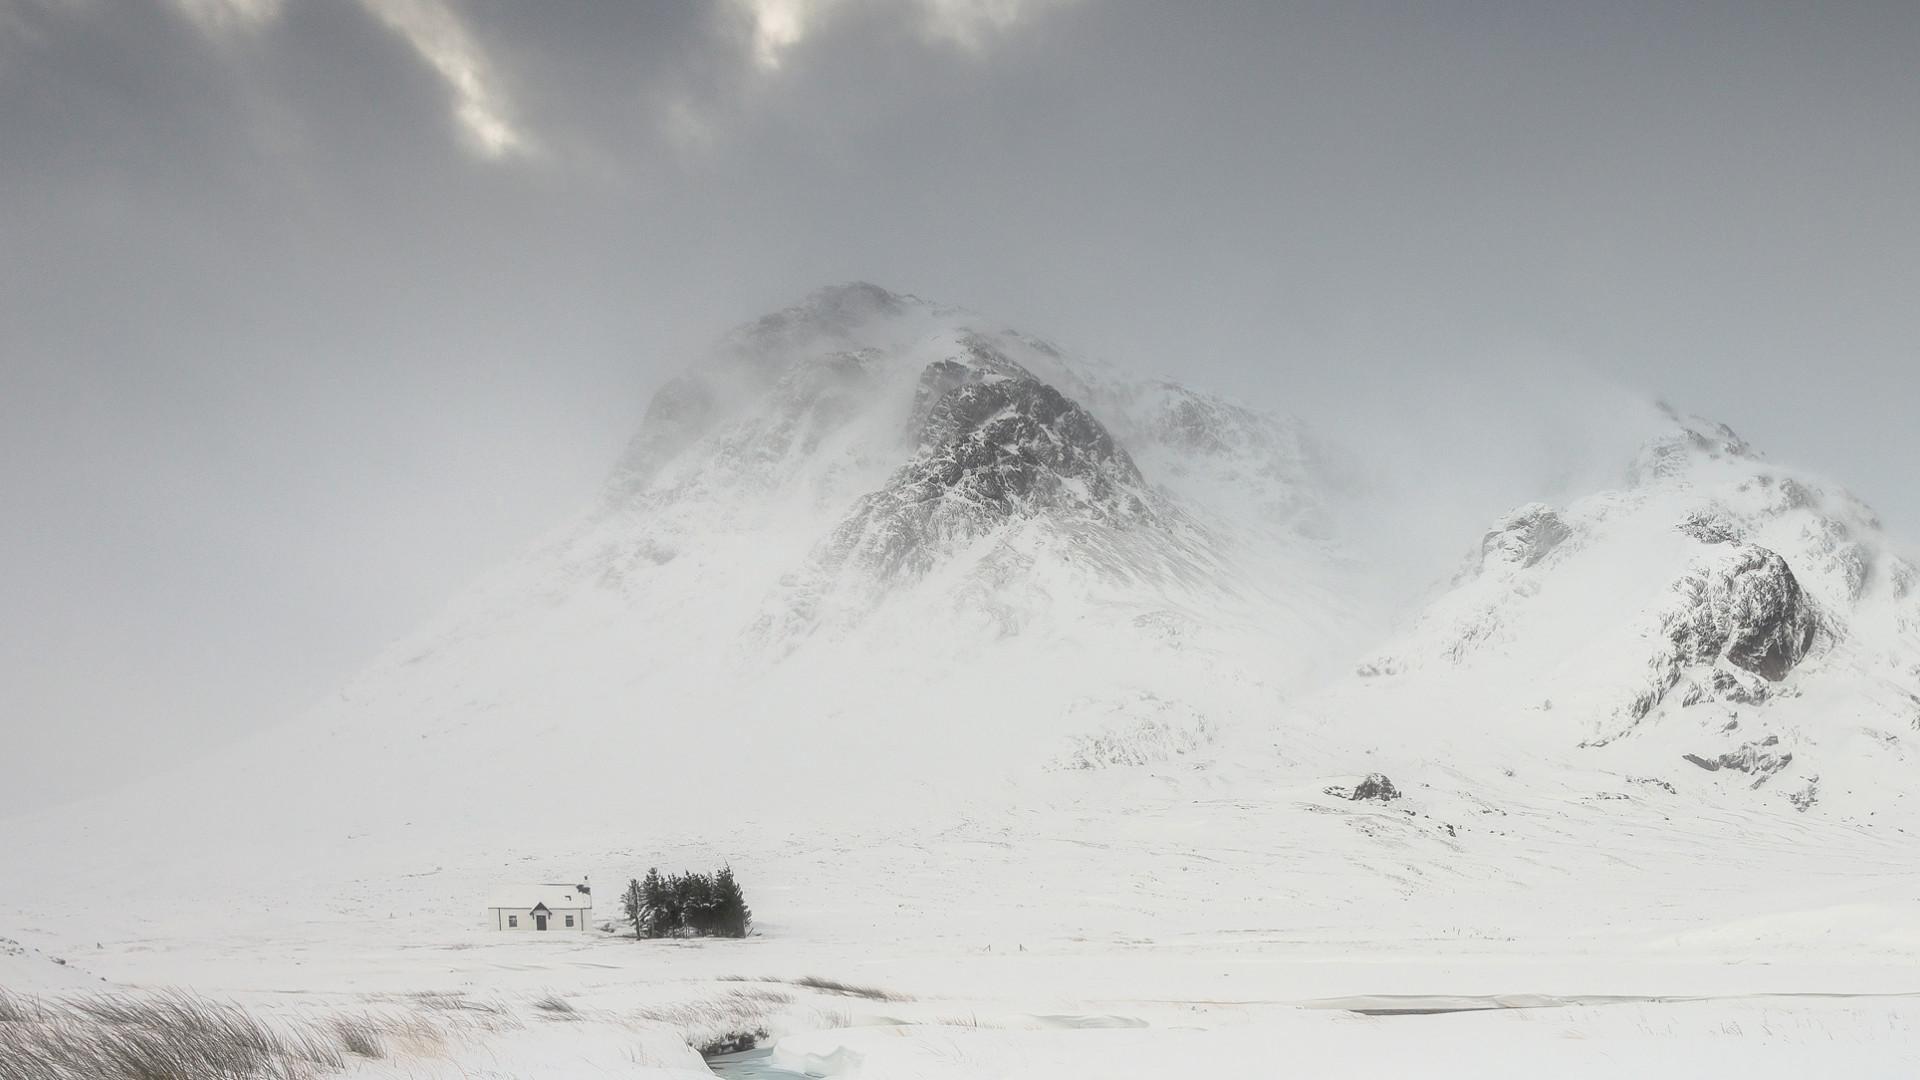 Winter storm blowing through Glencoe